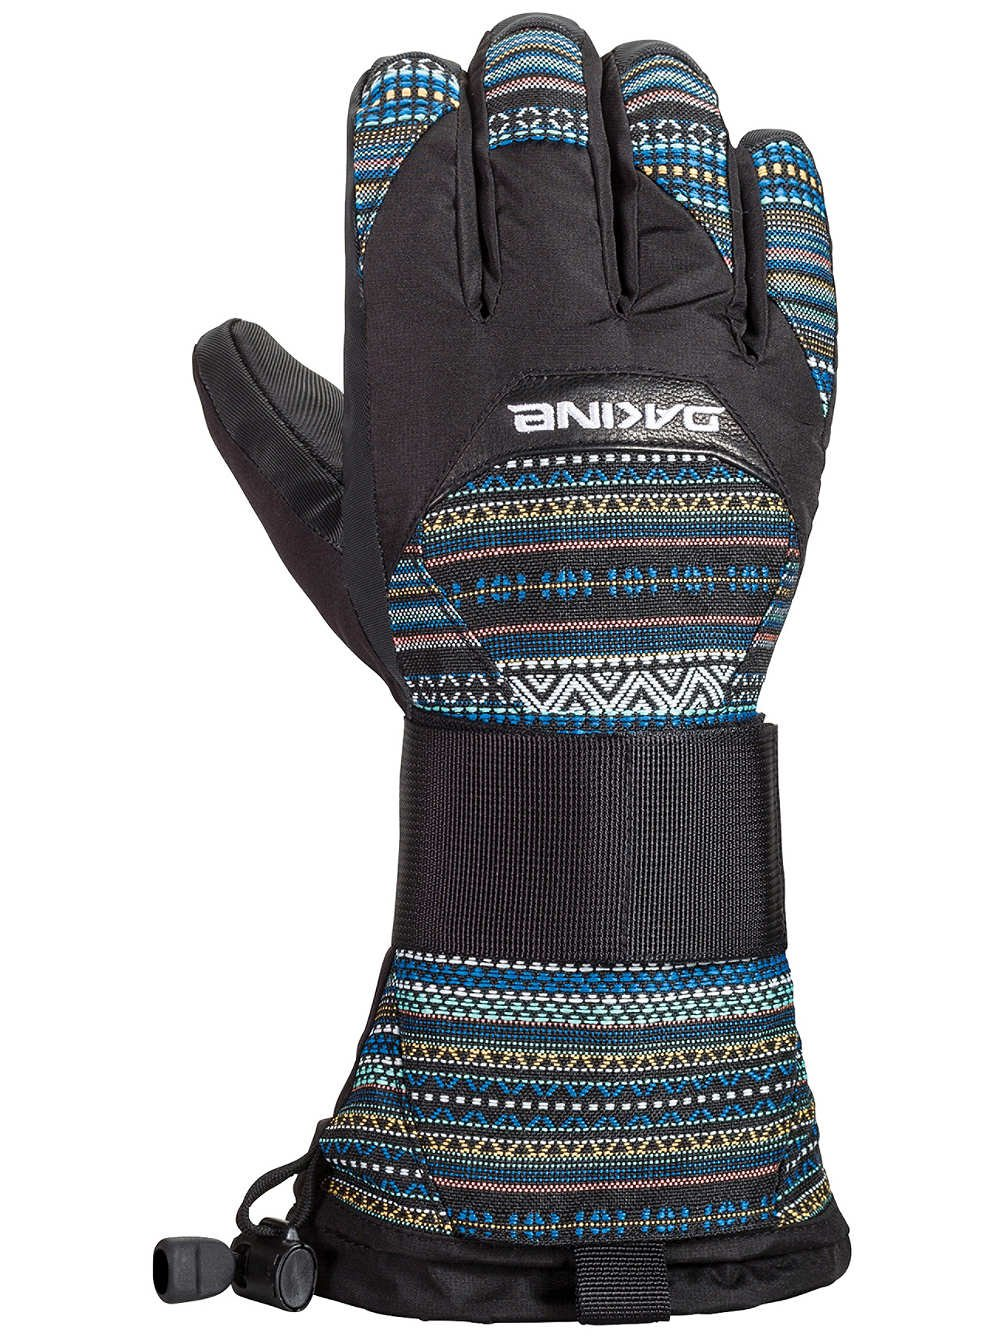 Dakine Women's Wristguard Gloves, Cortez, S (Small) by Dakine (Image #1)